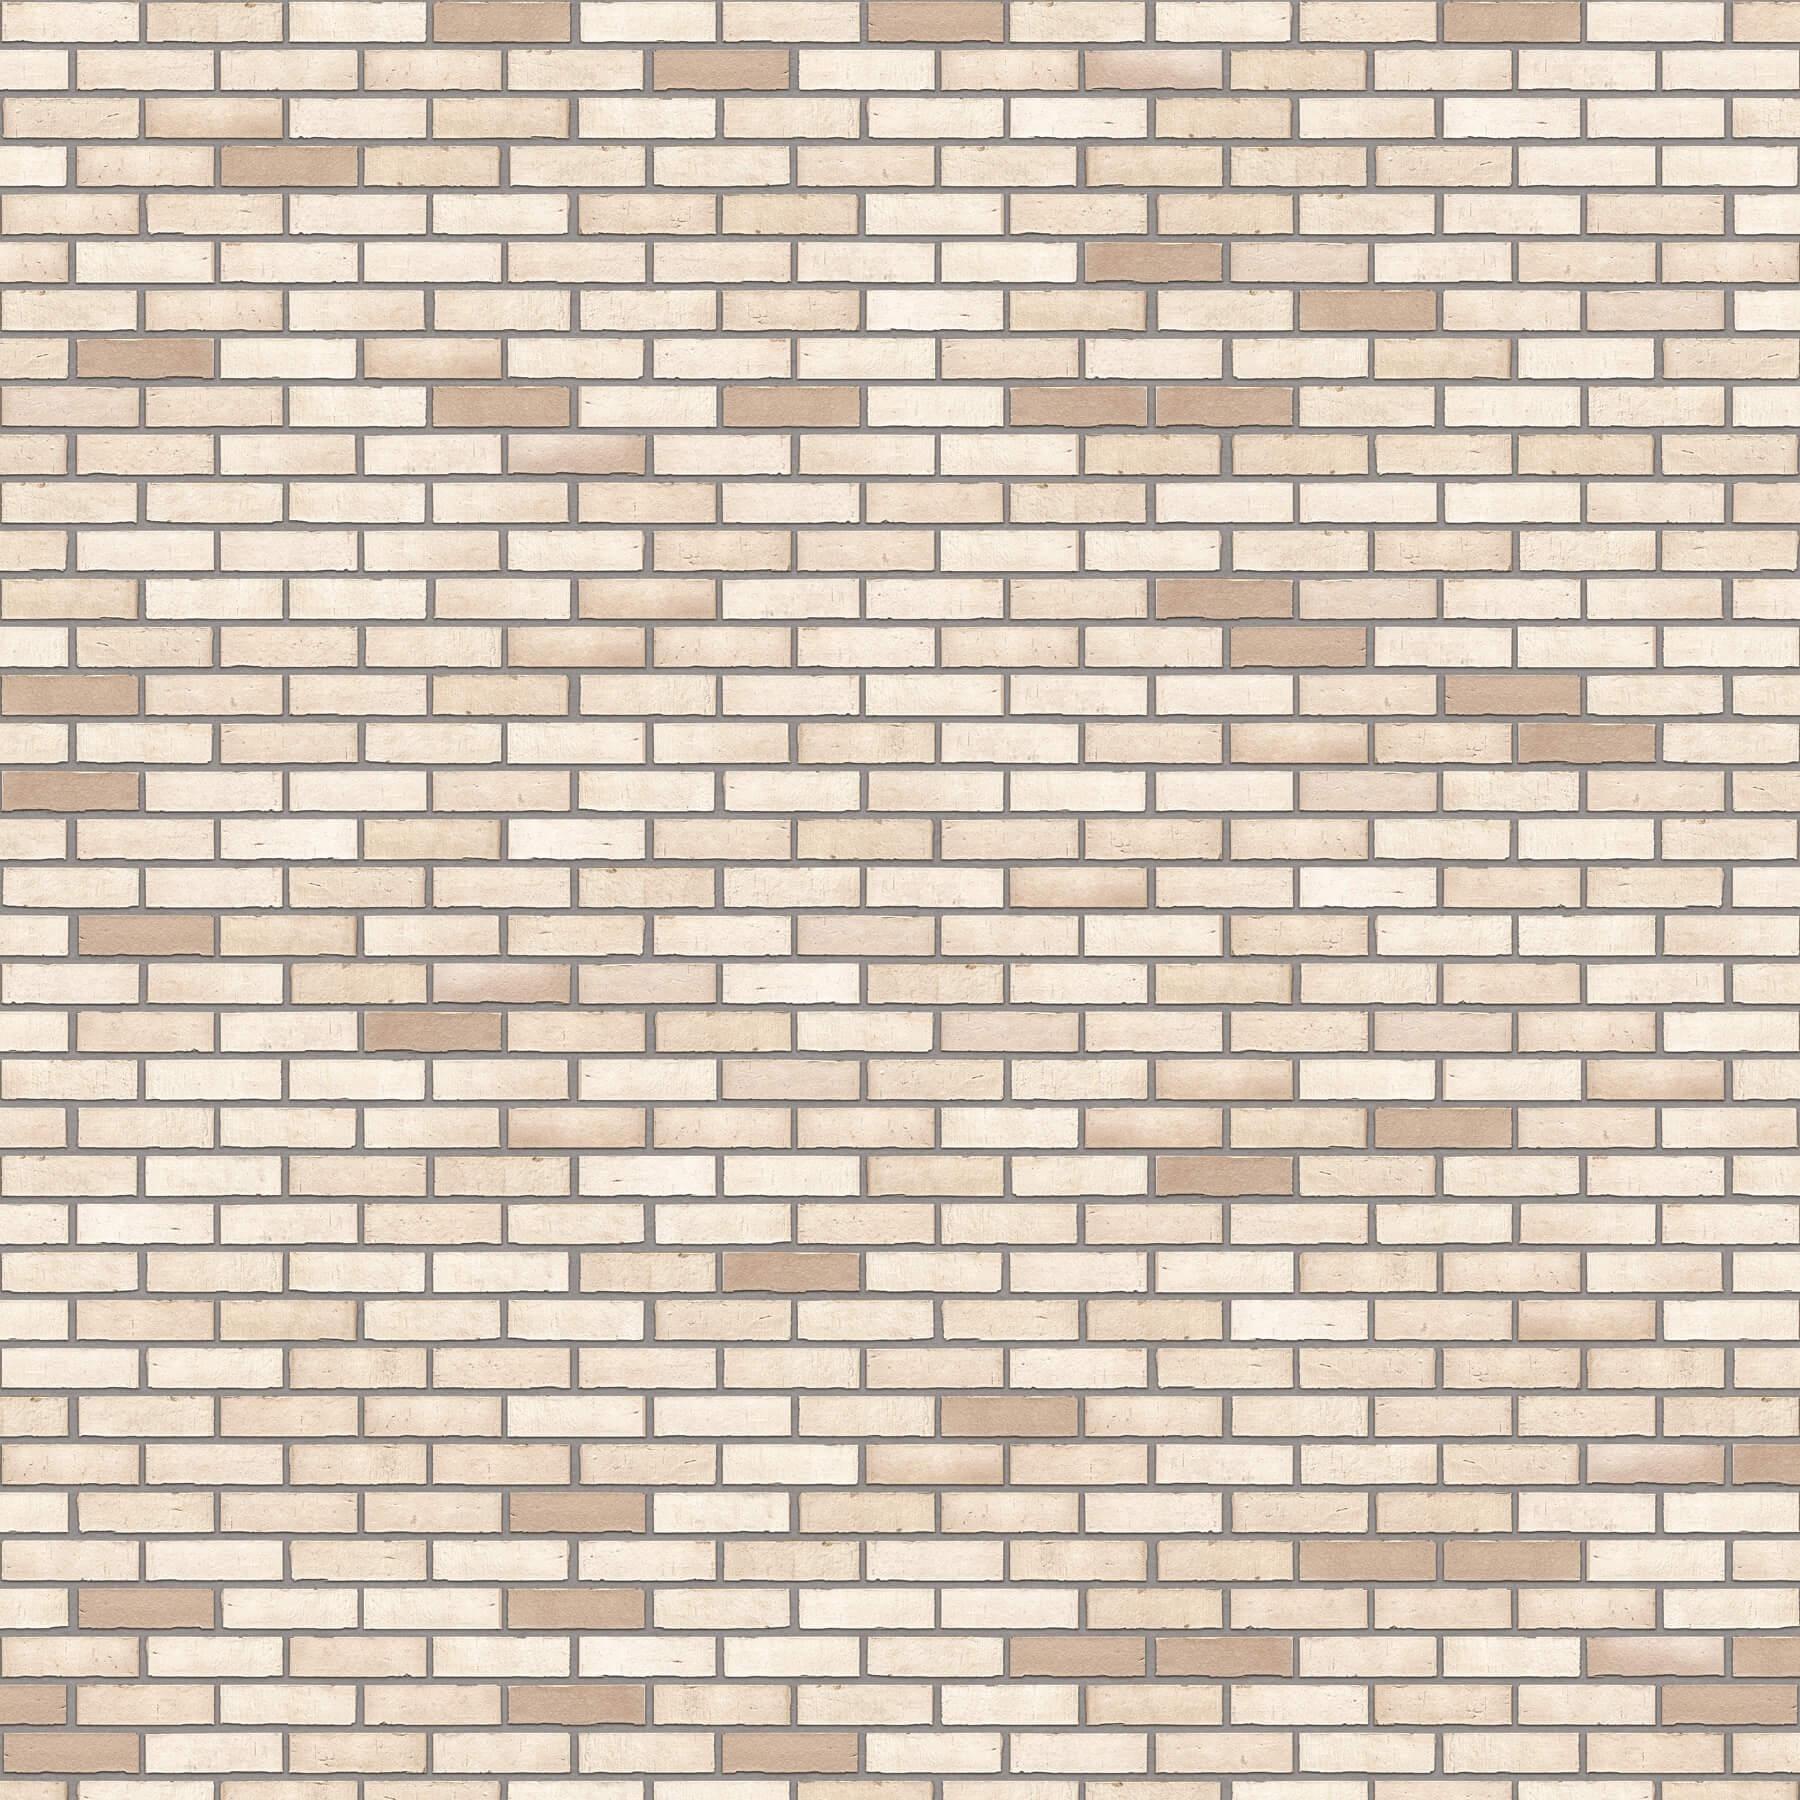 Puna-cigla-FeldHaus-Klinker-brick-house-beograd-nf-k-941-Siva Fuga